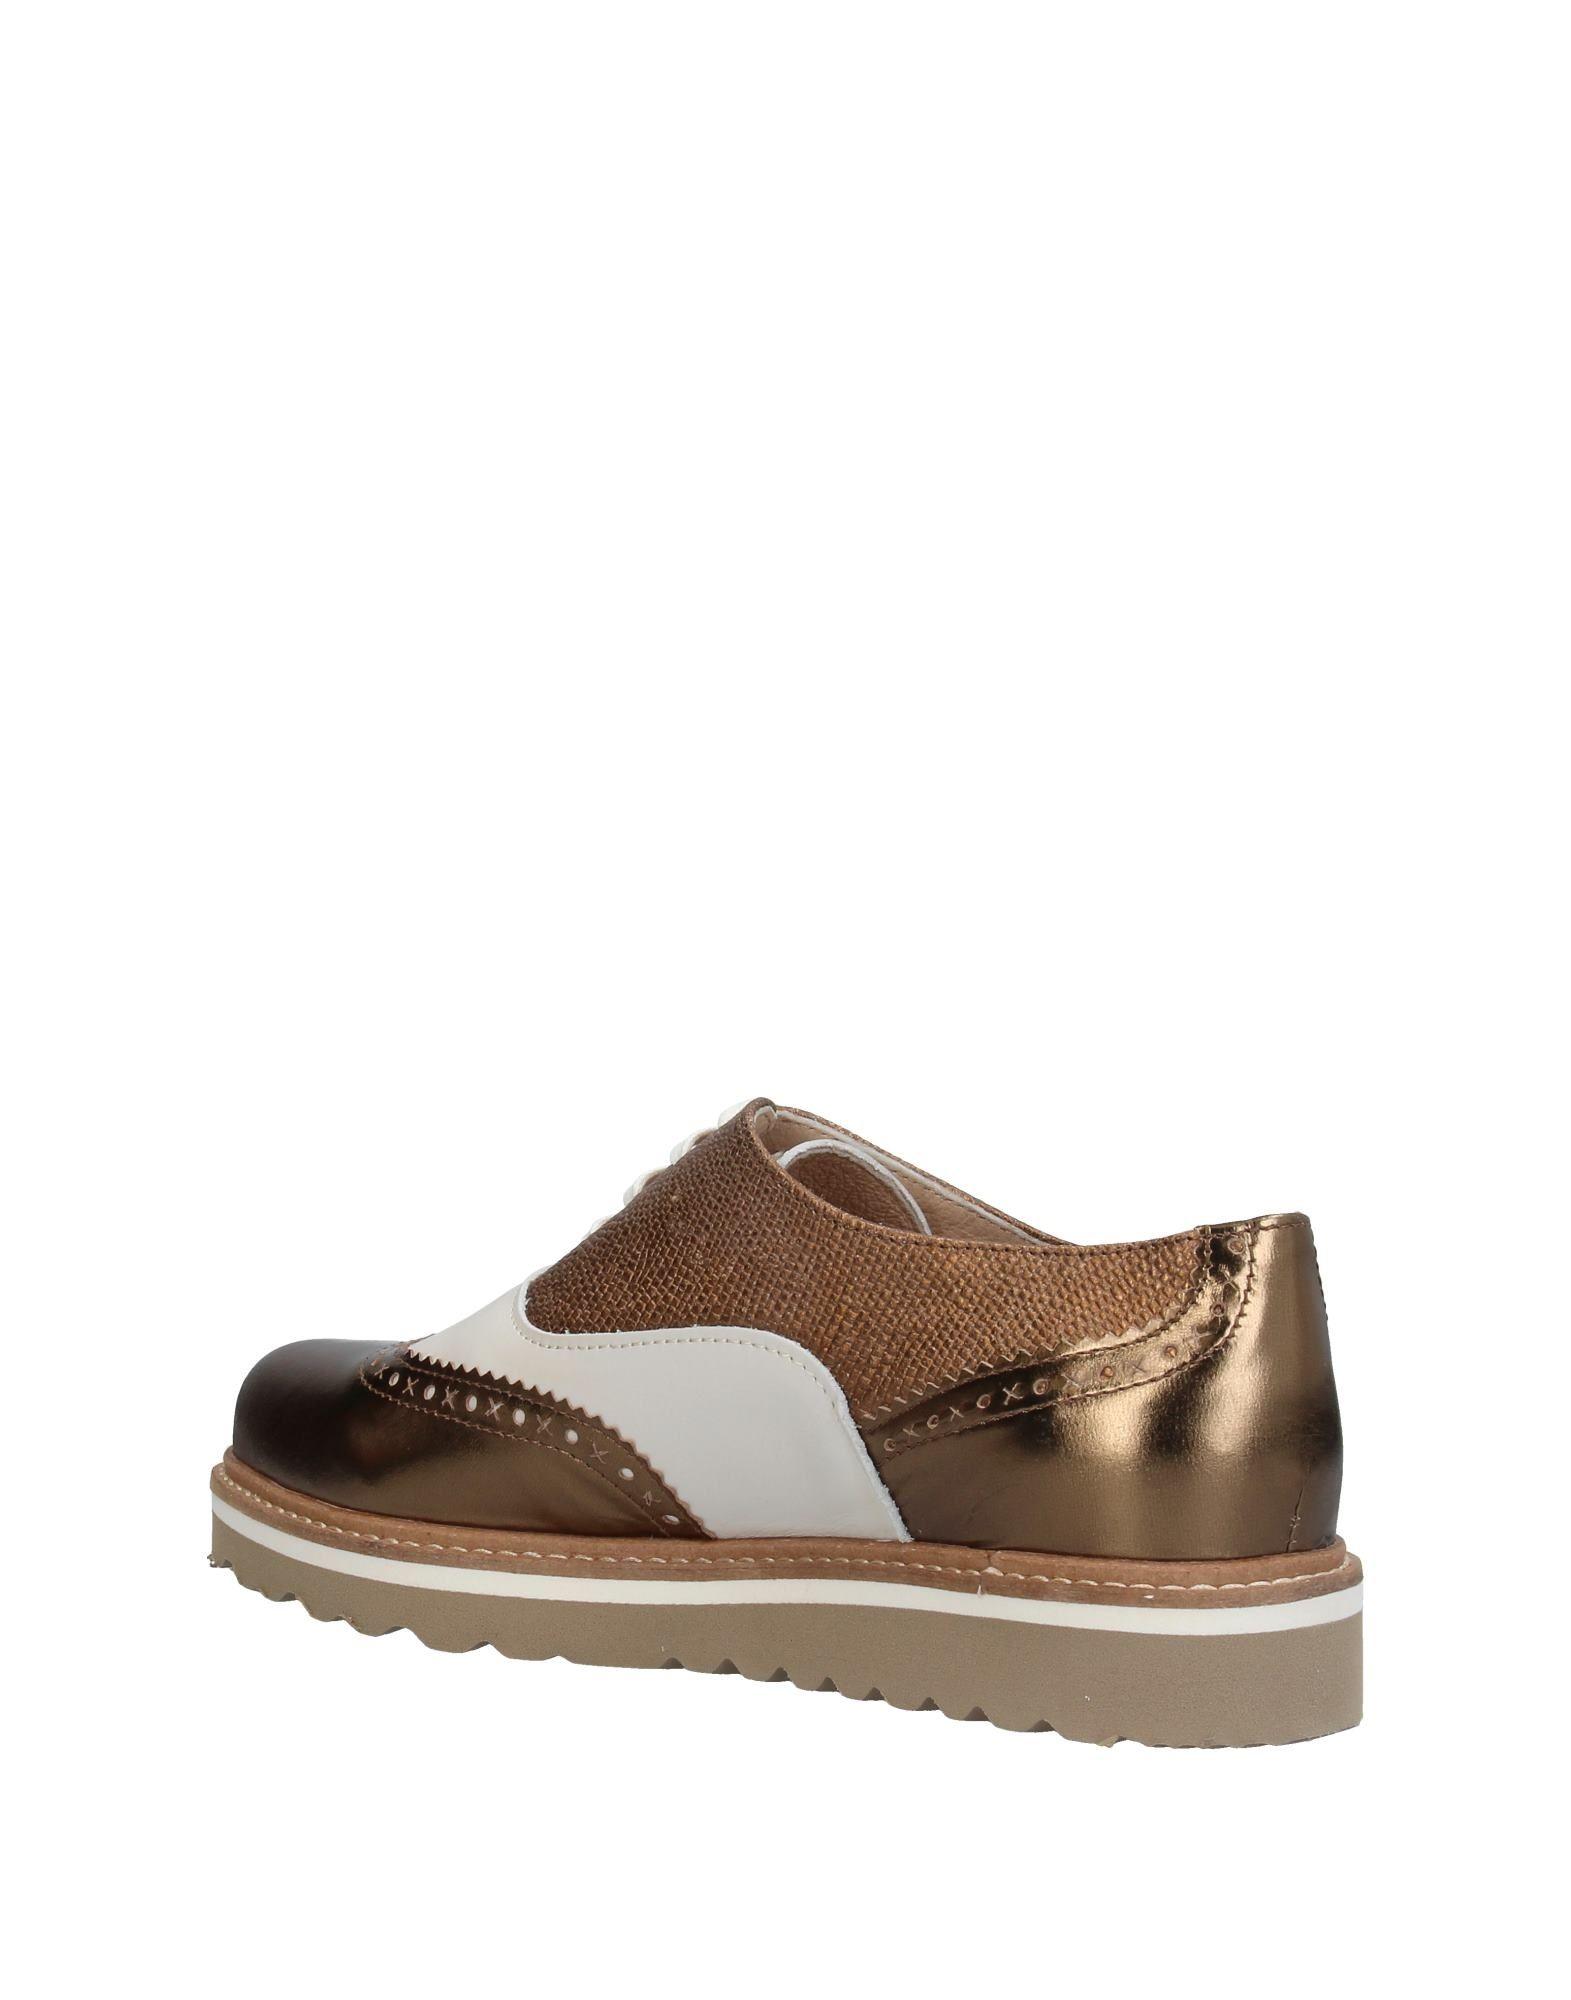 Trussardi Jeans Schnürschuhe Damen  11399355GG Gute Qualität beliebte beliebte beliebte Schuhe 4cf0b8